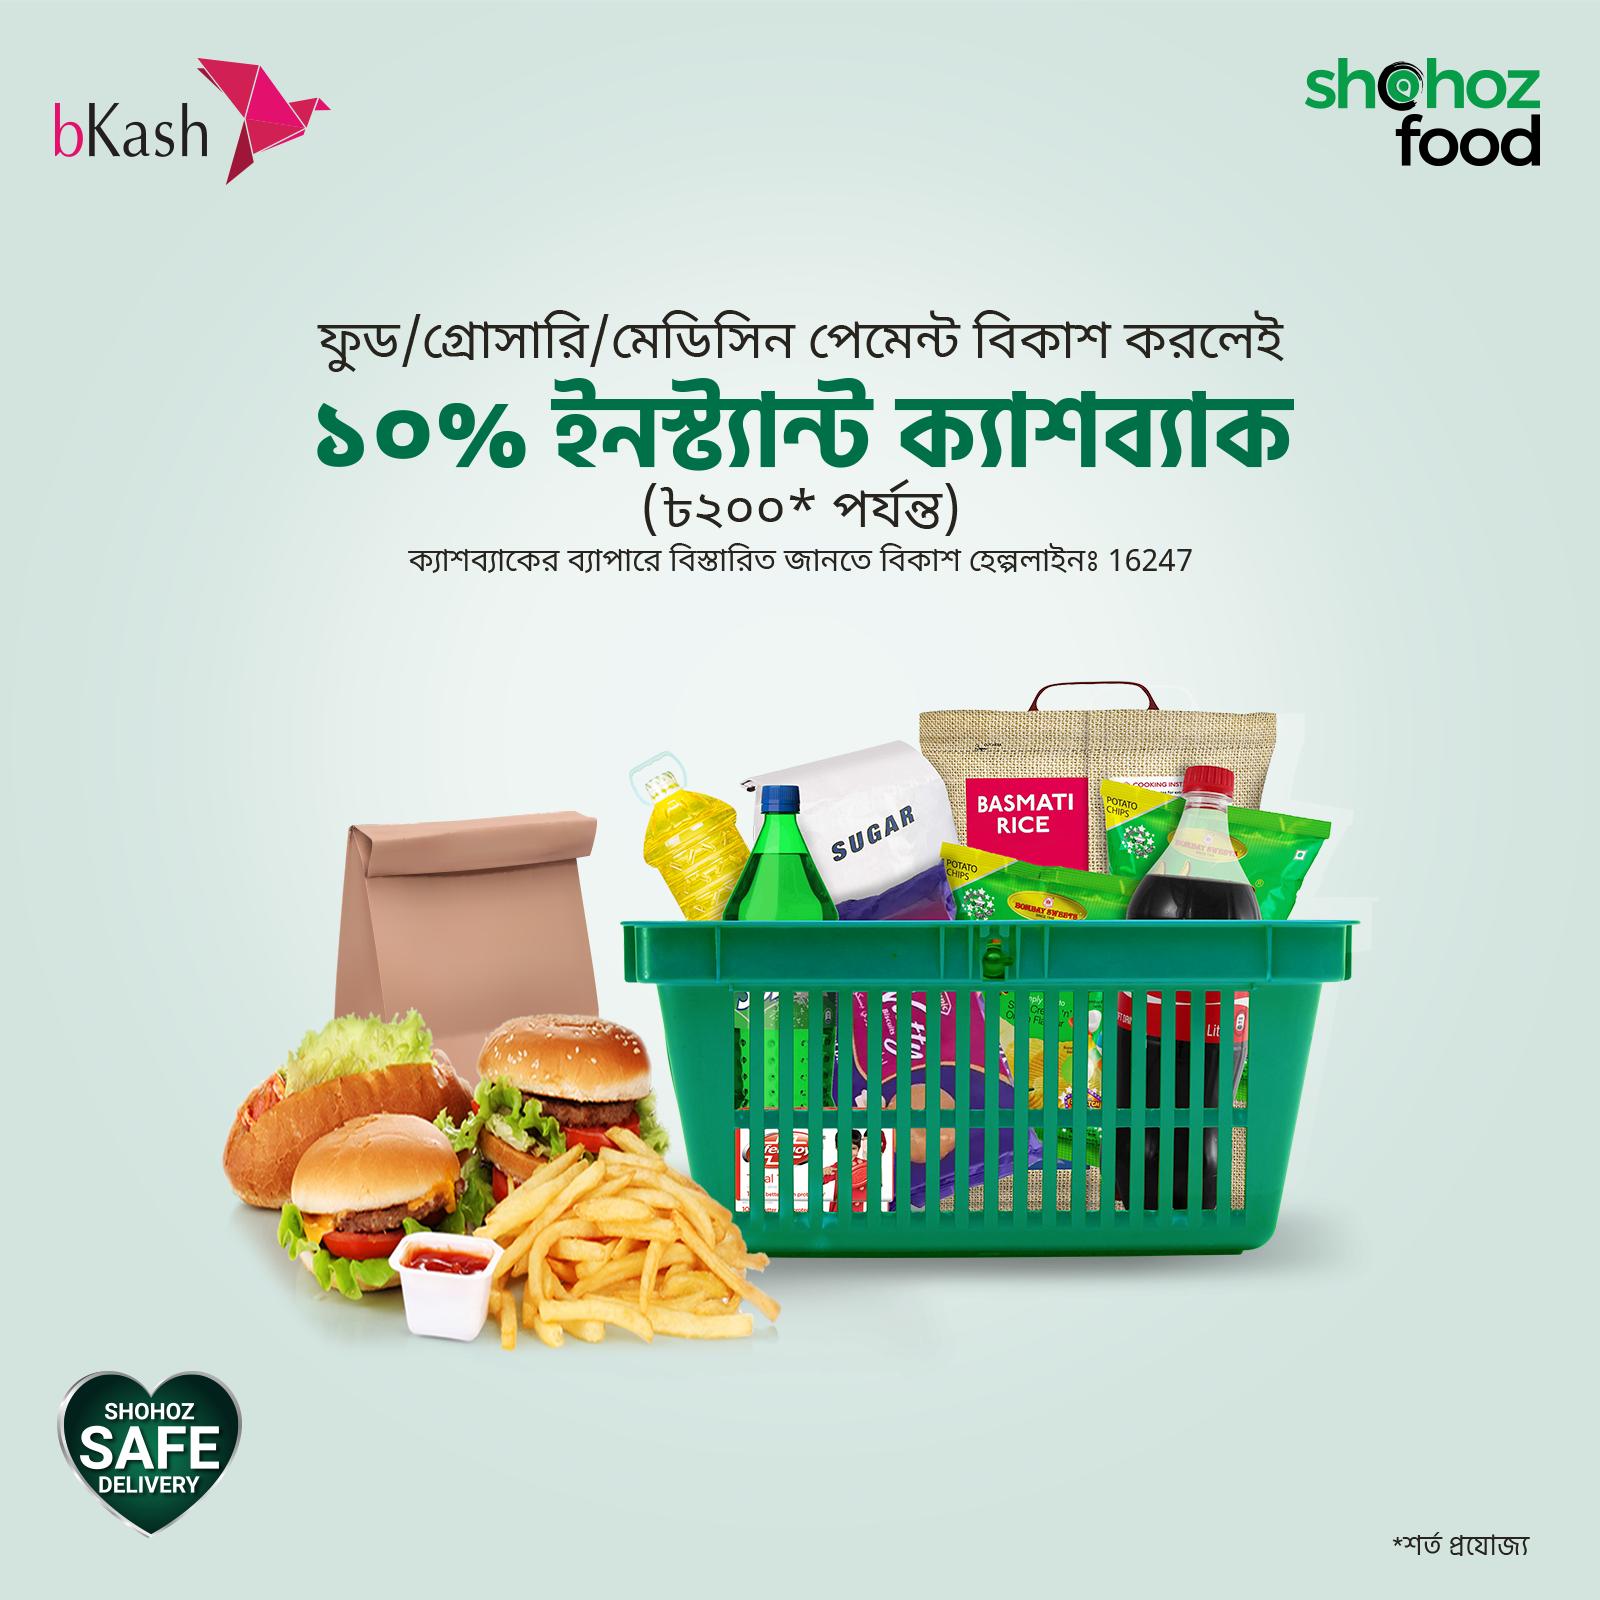 Shohoz bKash food offer